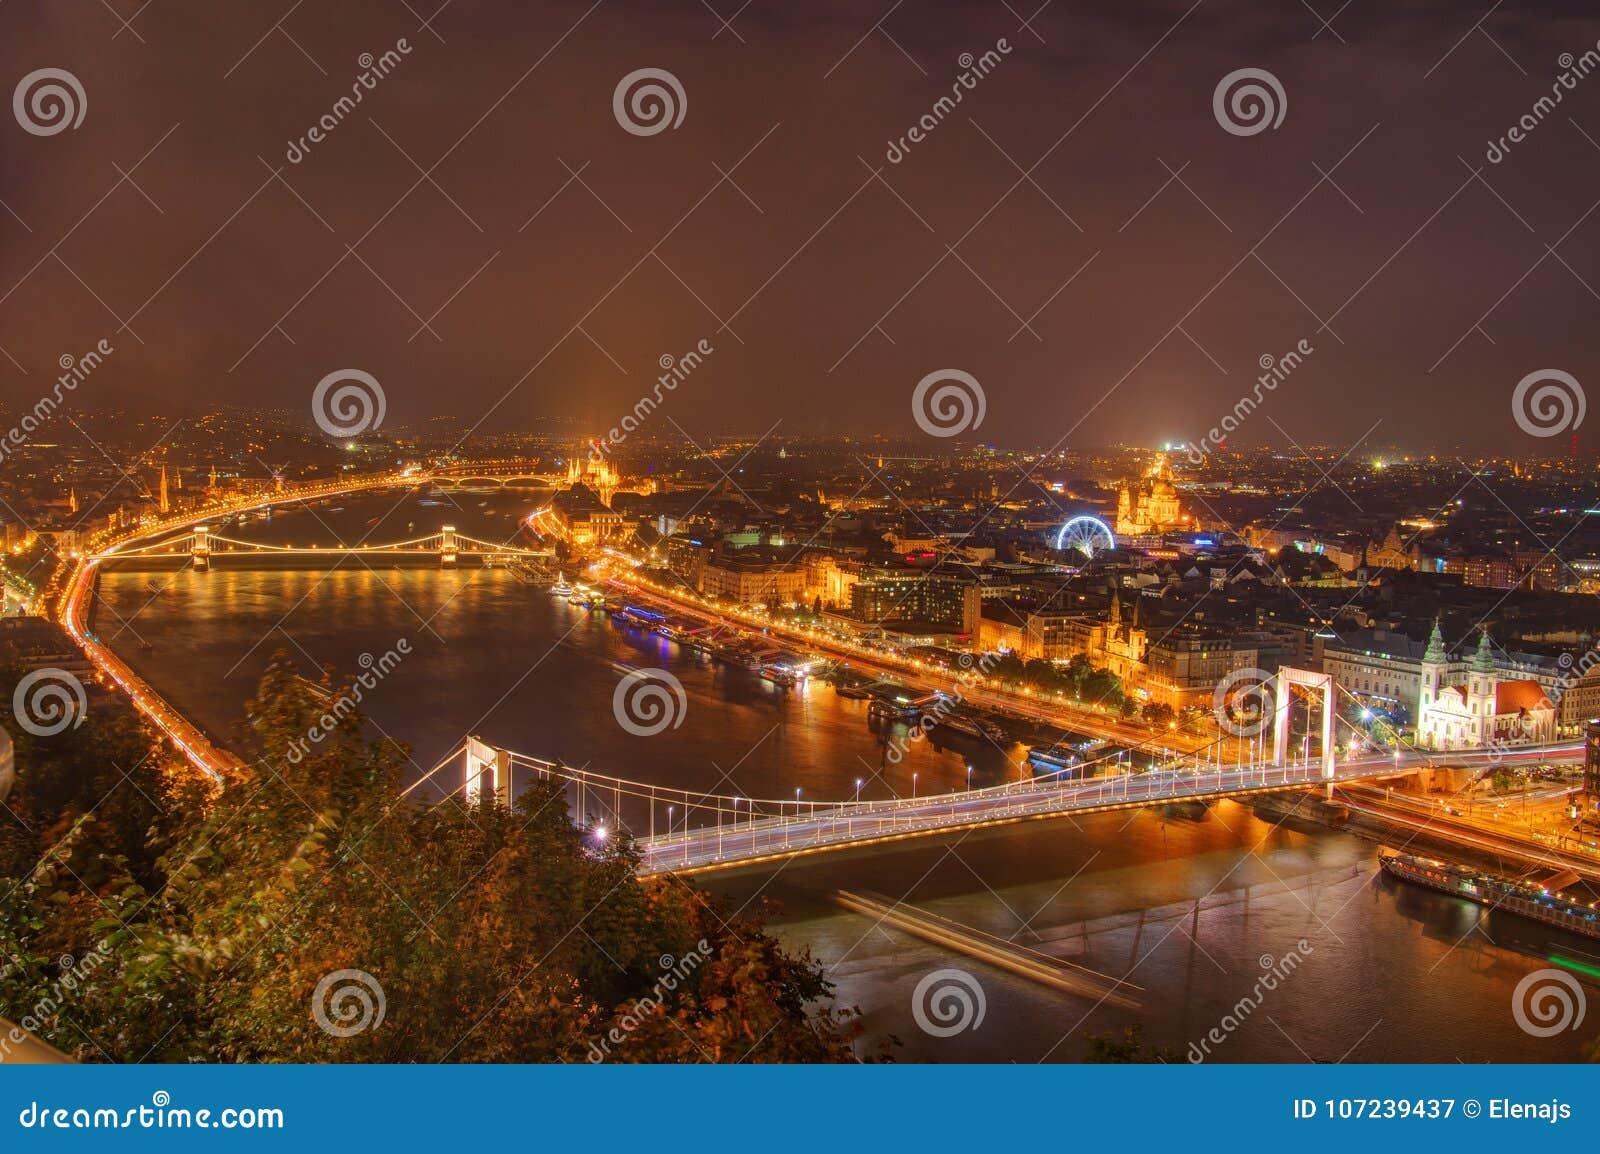 Hungary, Budapest, Danube, Elisabeth Bridge, Chain bridge - night picture